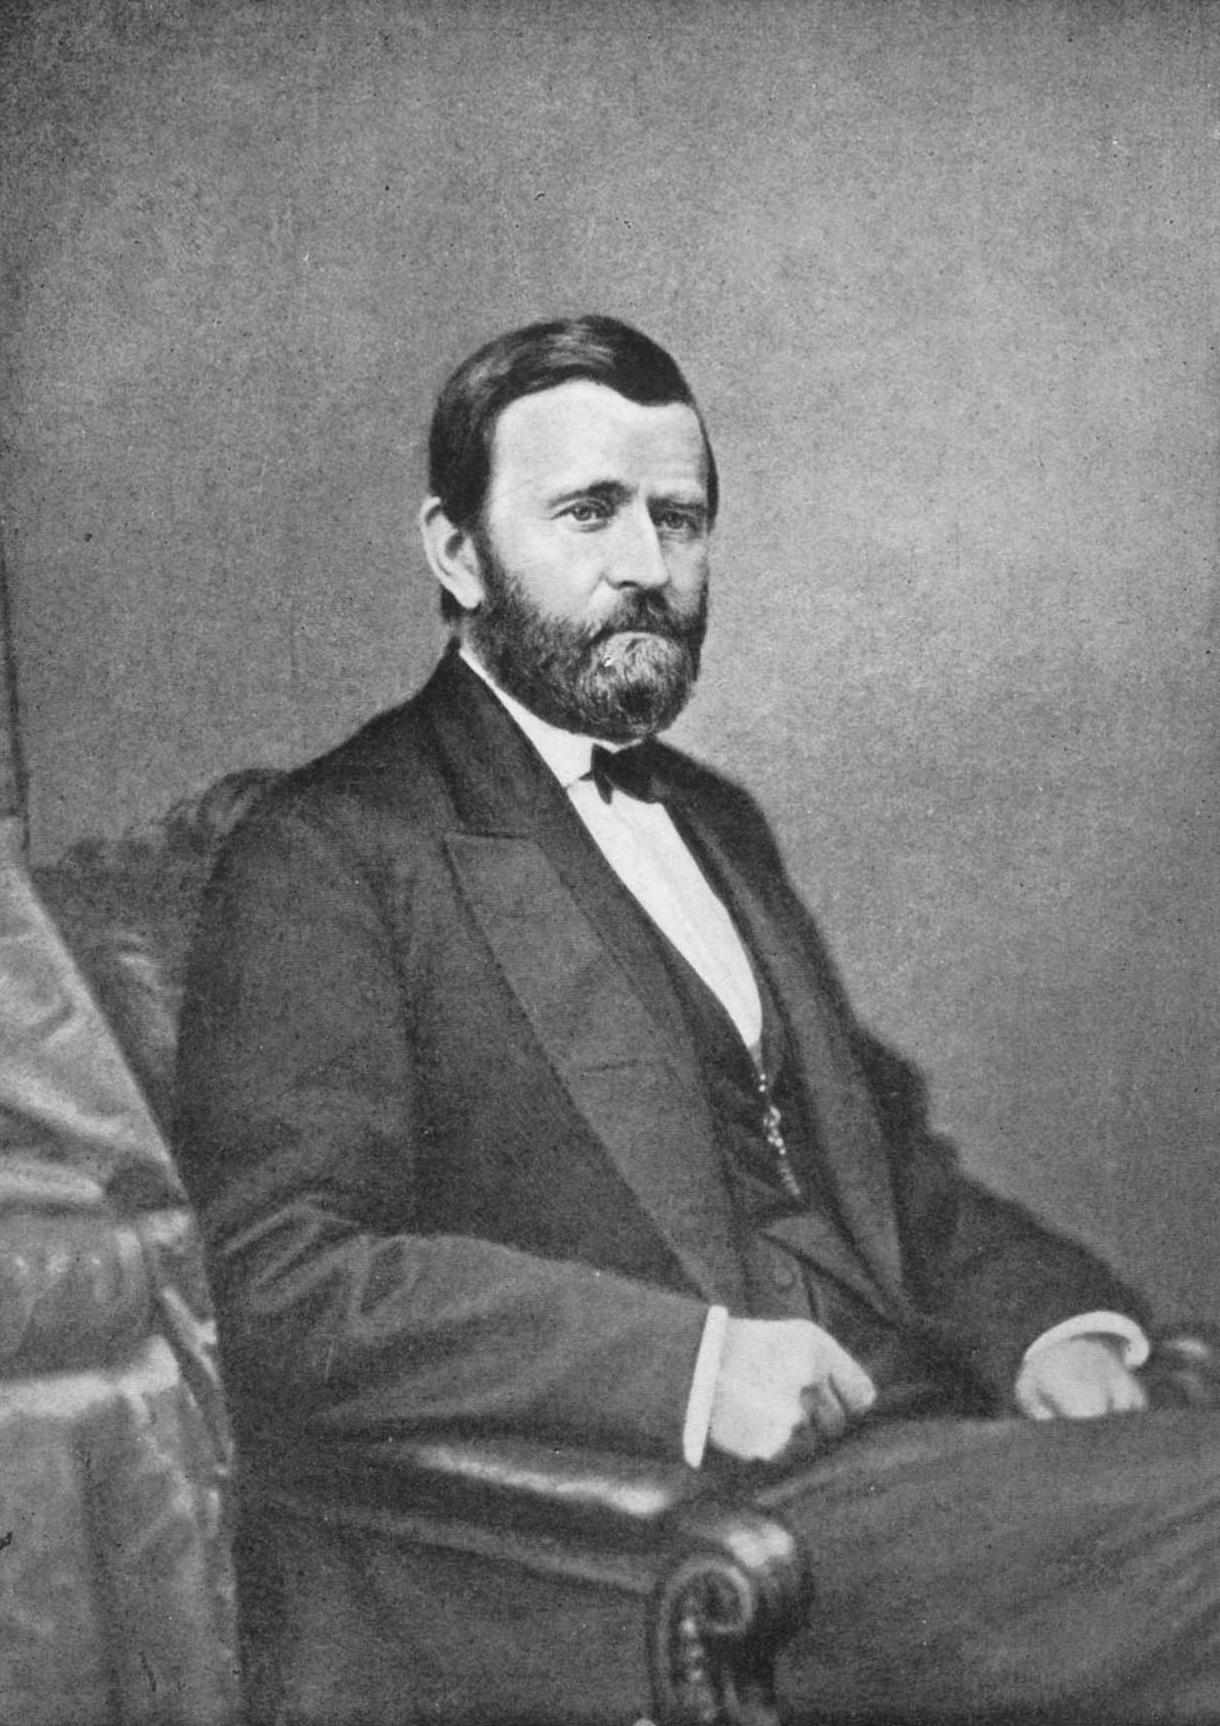 File:Ulysses S Grant.png.